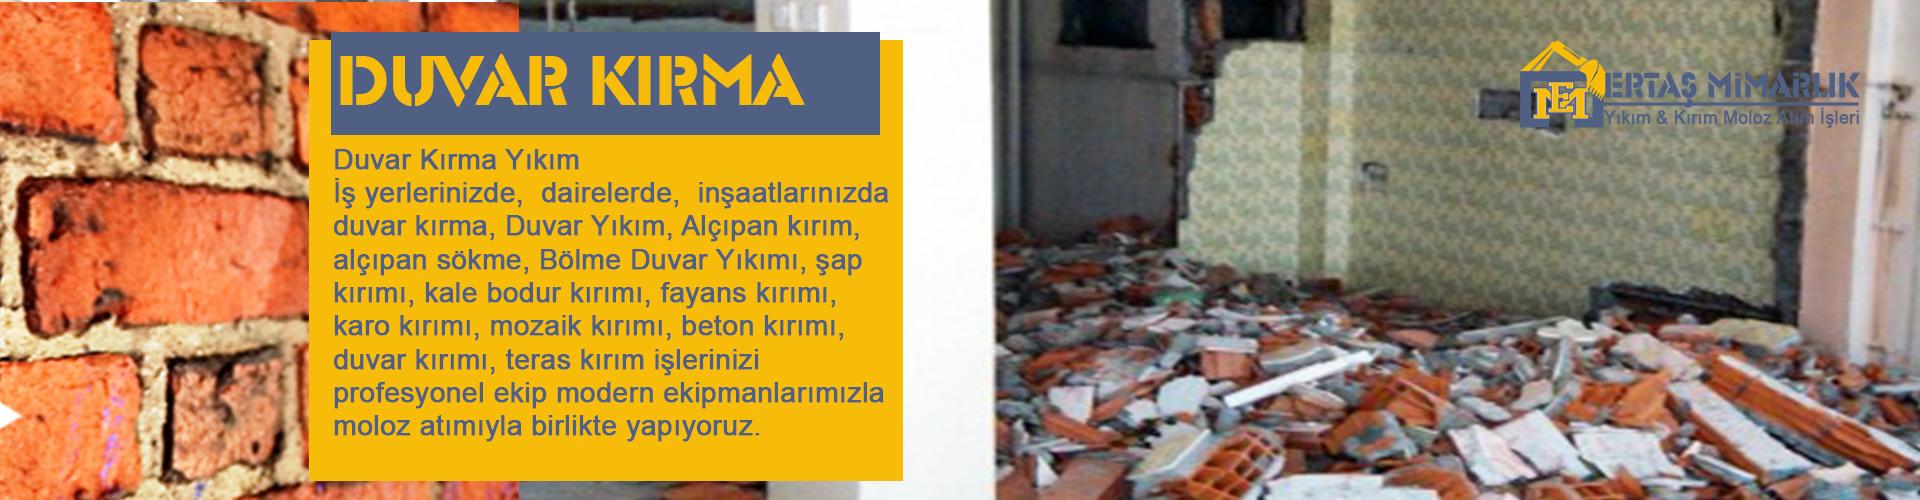 slide2_DUVAR-KIRMA